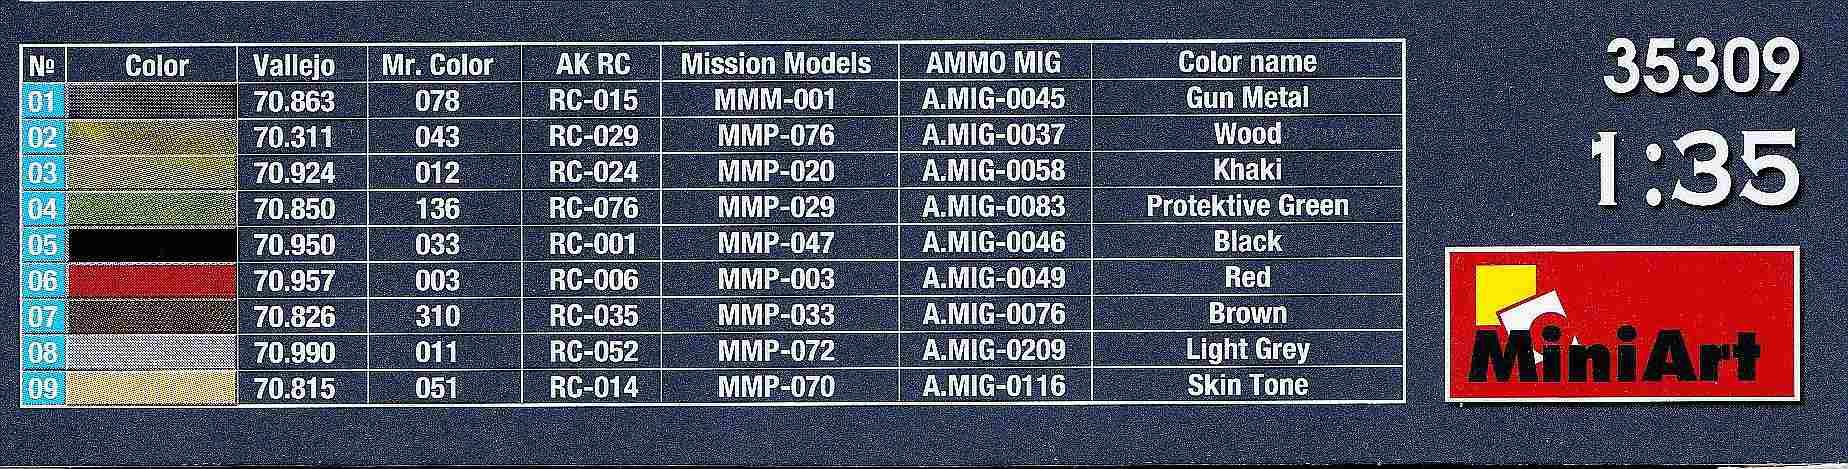 MIniArt-35309-Soviet-Tank-Riders-1-2 Soviet Tank Riders in 1:35 von MiniArt #35309 und 35310